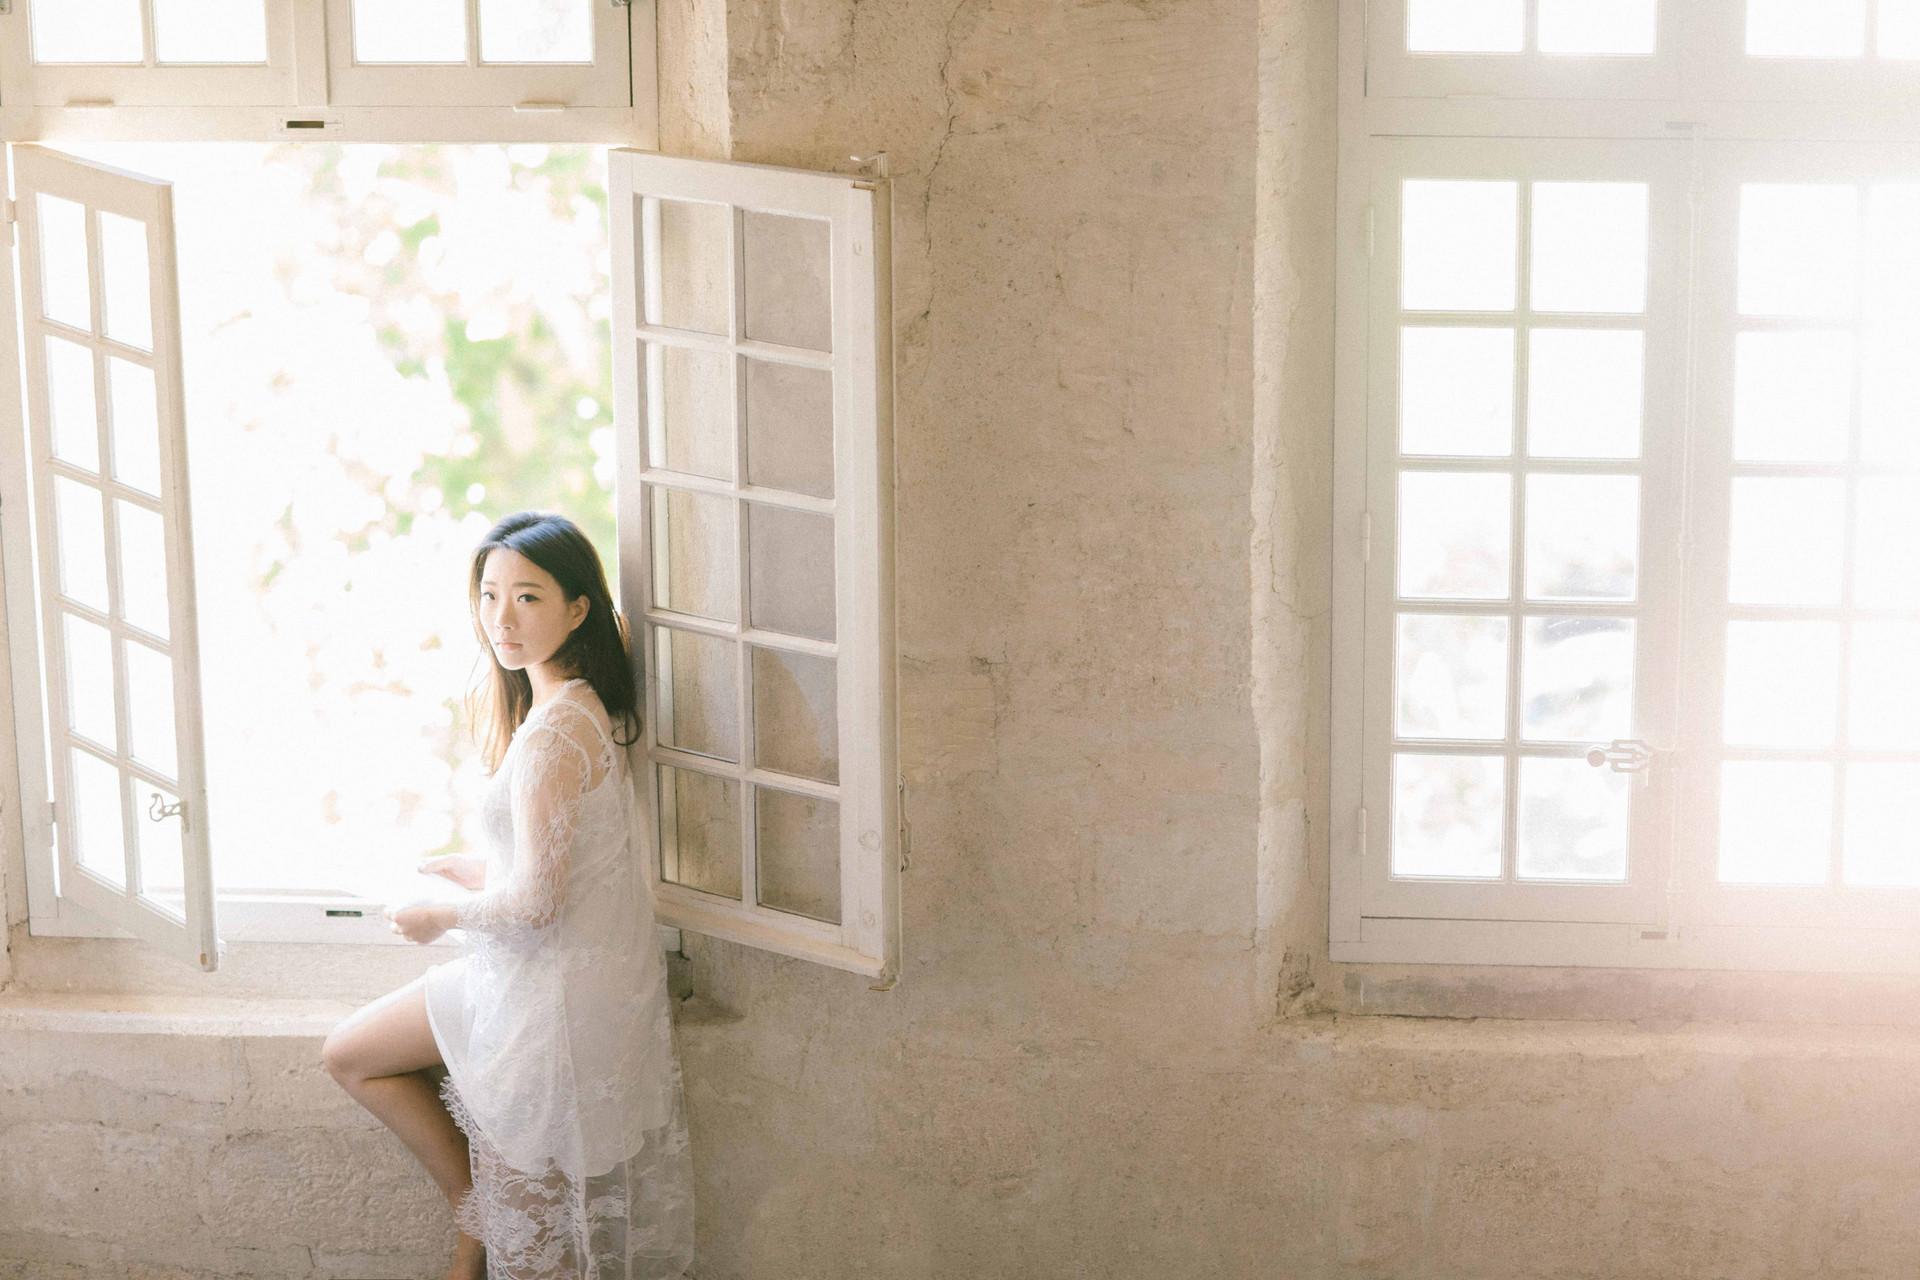 Lukas Chan Photo Lab - Ivy Solo - website-18.jpg